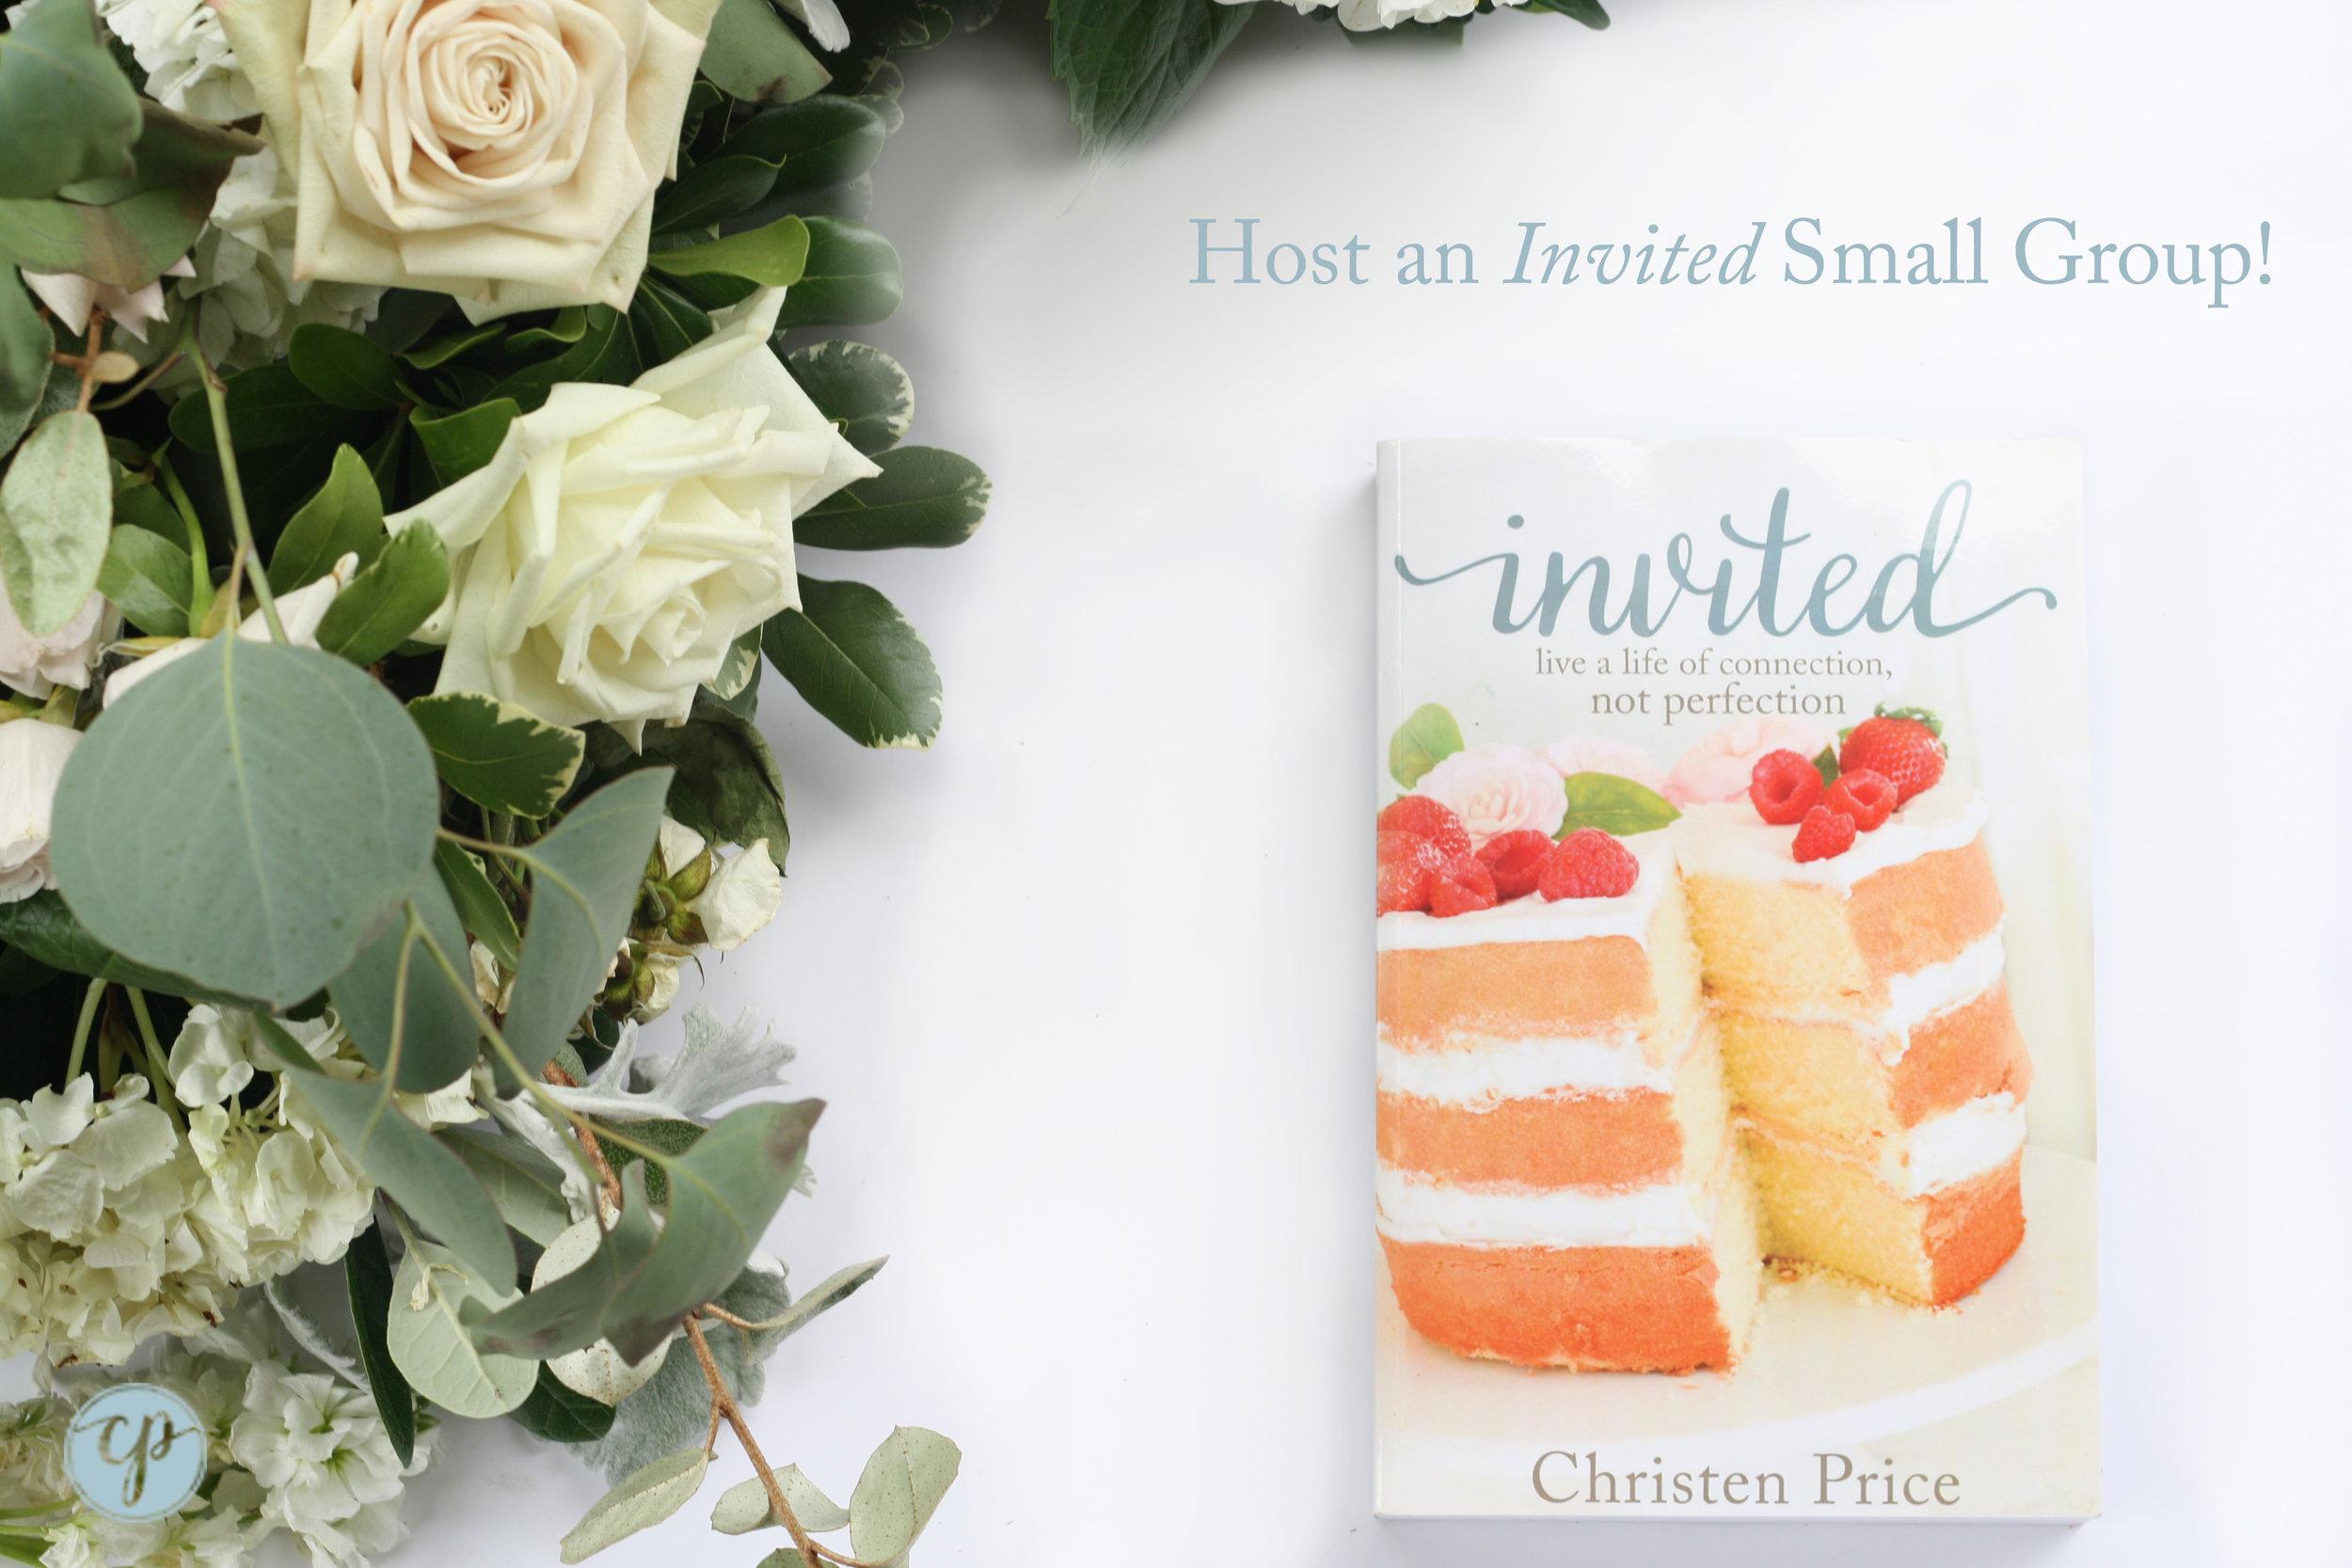 host an invited small group!.jpg